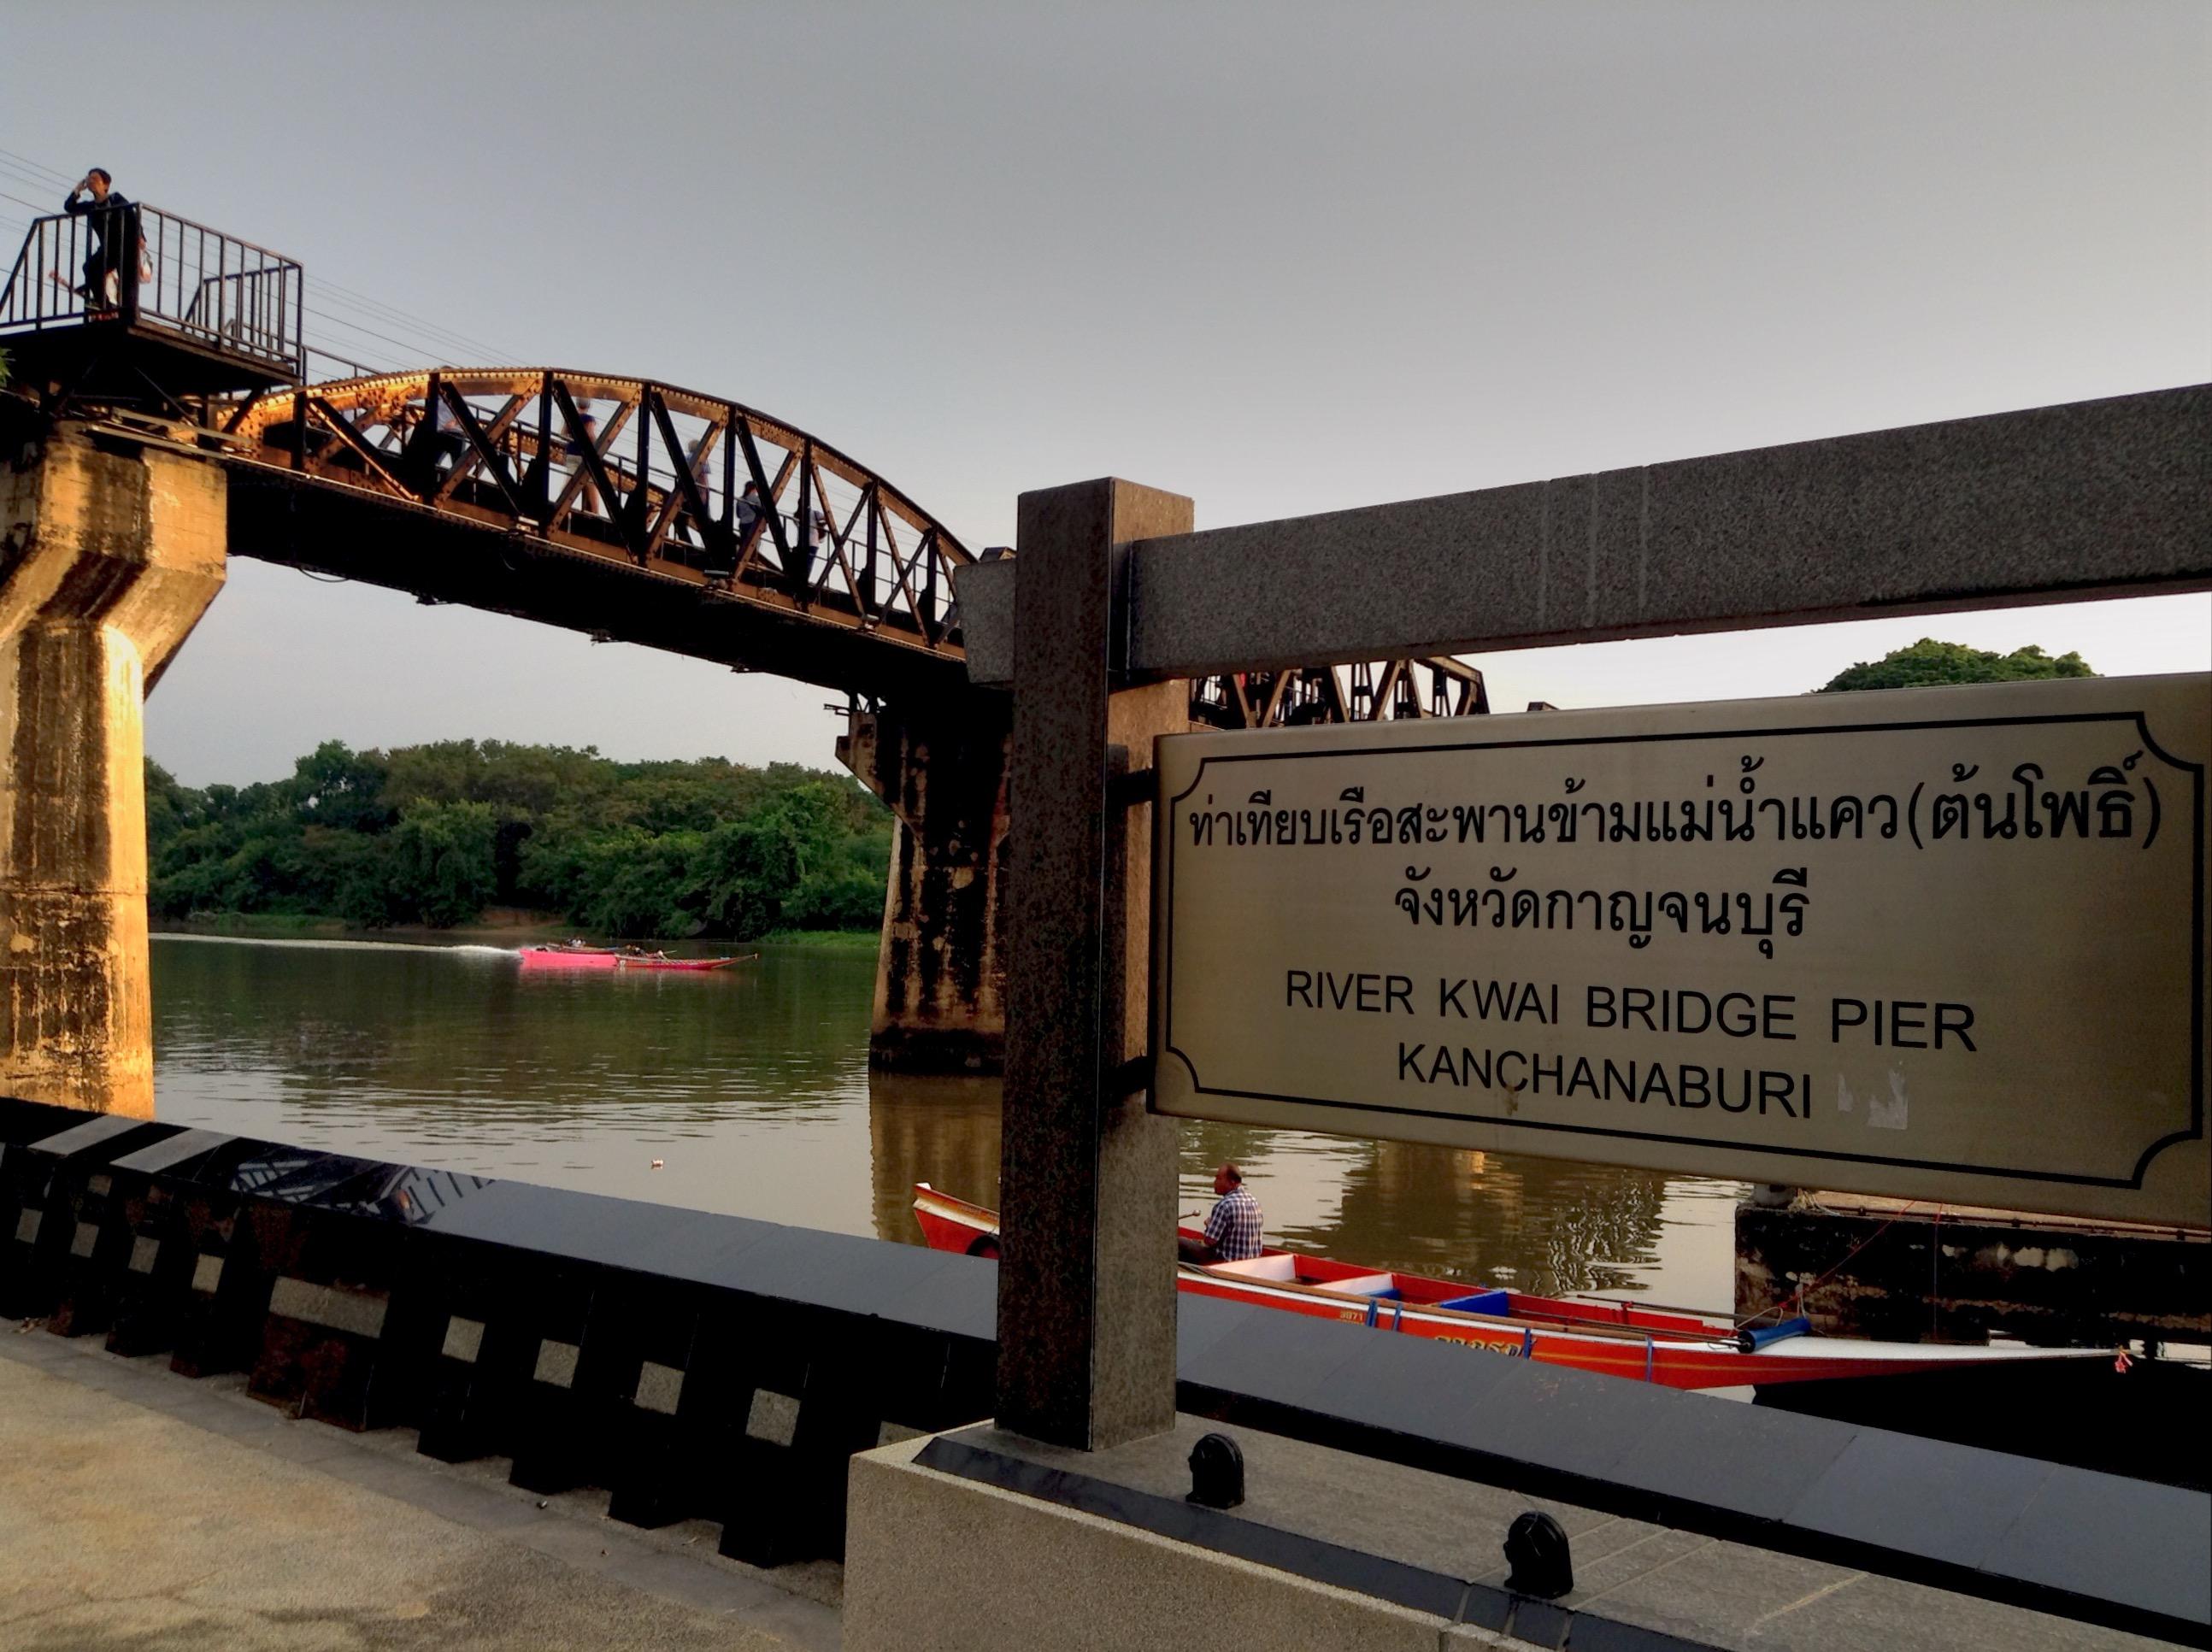 Next to the bridge